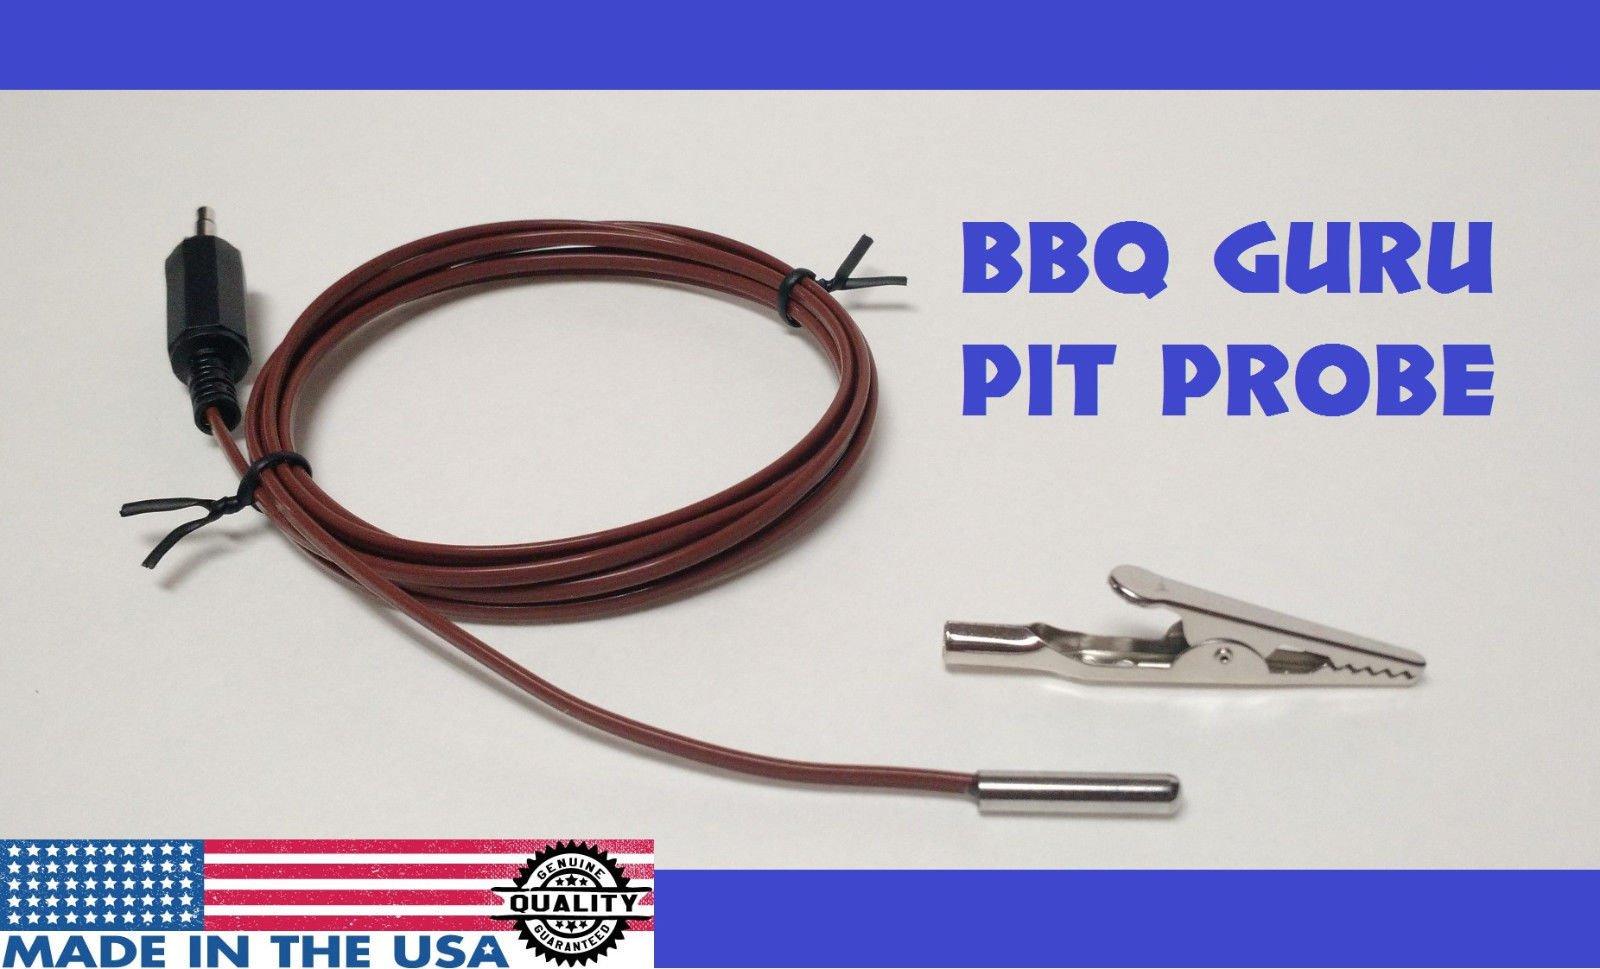 BBQ Guru Compatible 6/' Pit Probe Thermometer Grill Smoker PartyQ DigiQ CyberQ HT